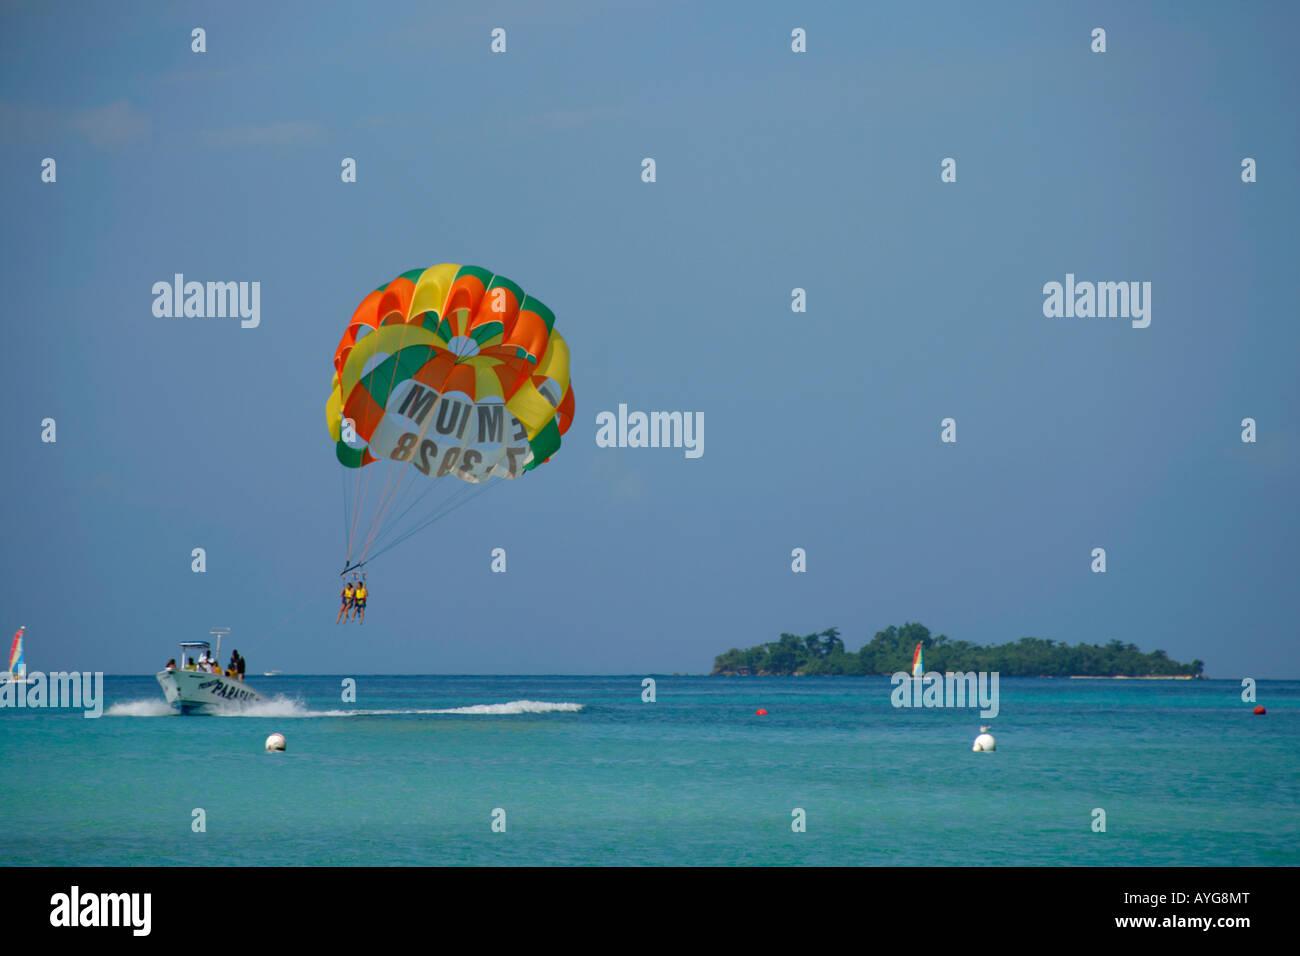 Jamaica Negril beach Parasailing boat Stock Photo